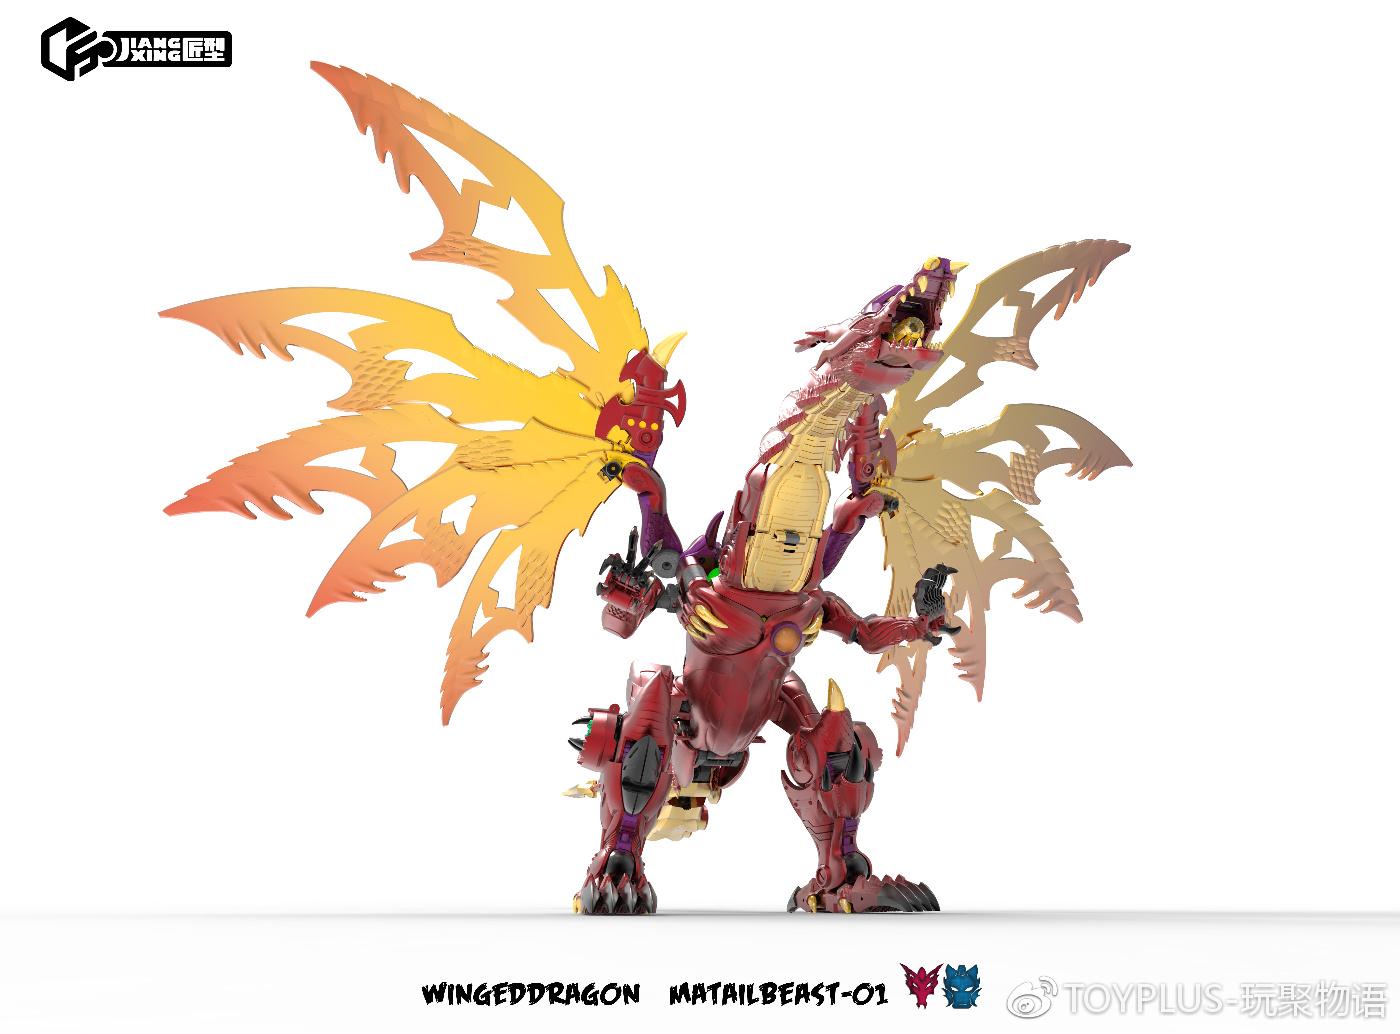 Jiang Xing JX-Metalbeast-01 Winged Dragon (BW Transmetal 2 ...